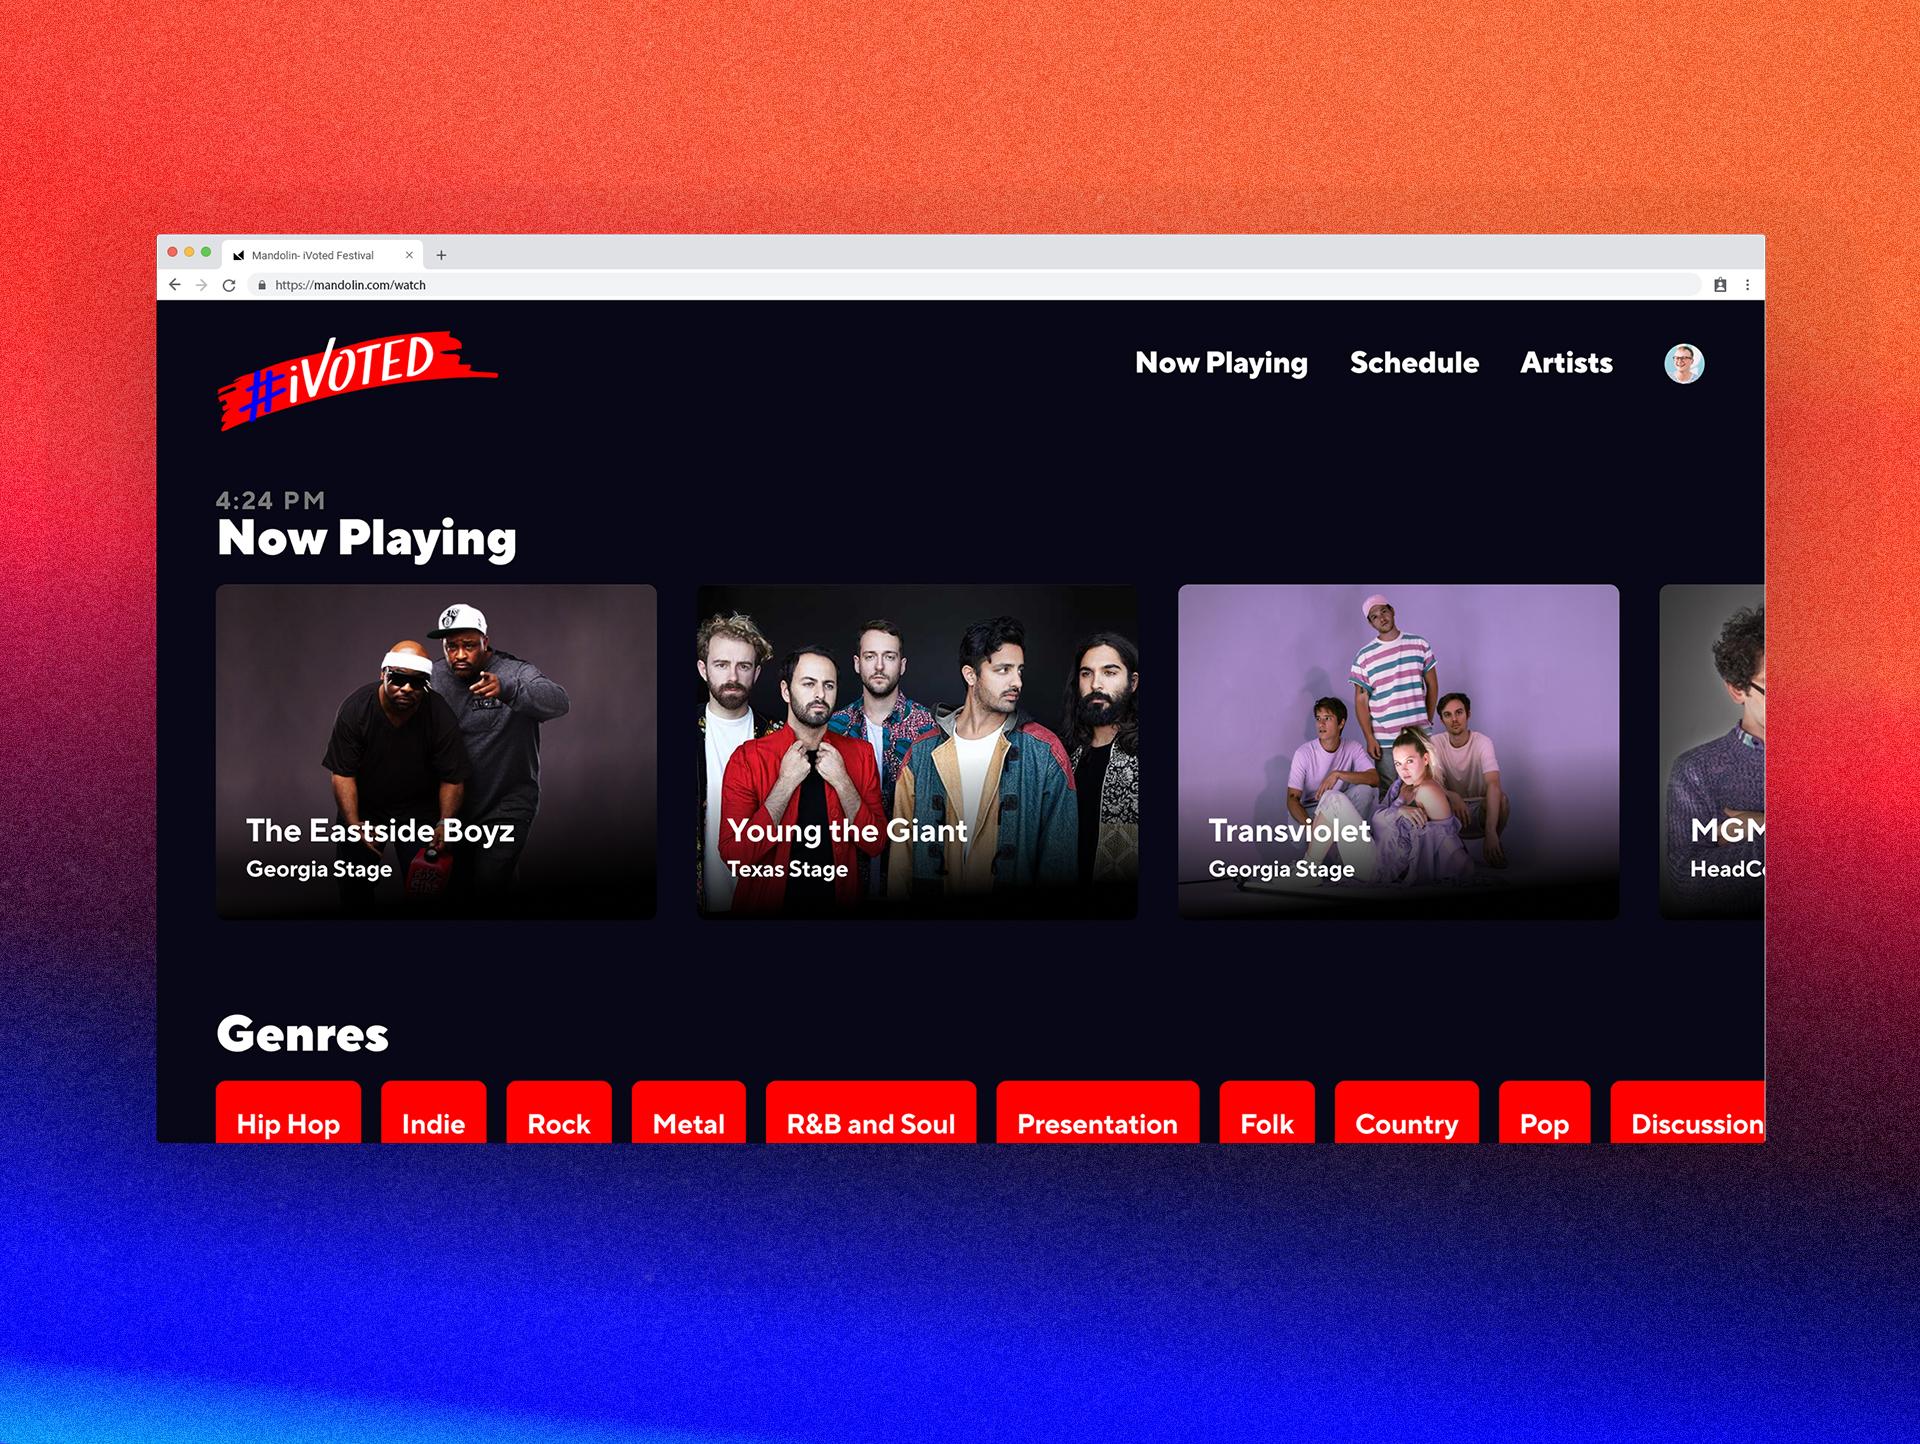 Festival Grid: Festivals Go Digital With Mandolin